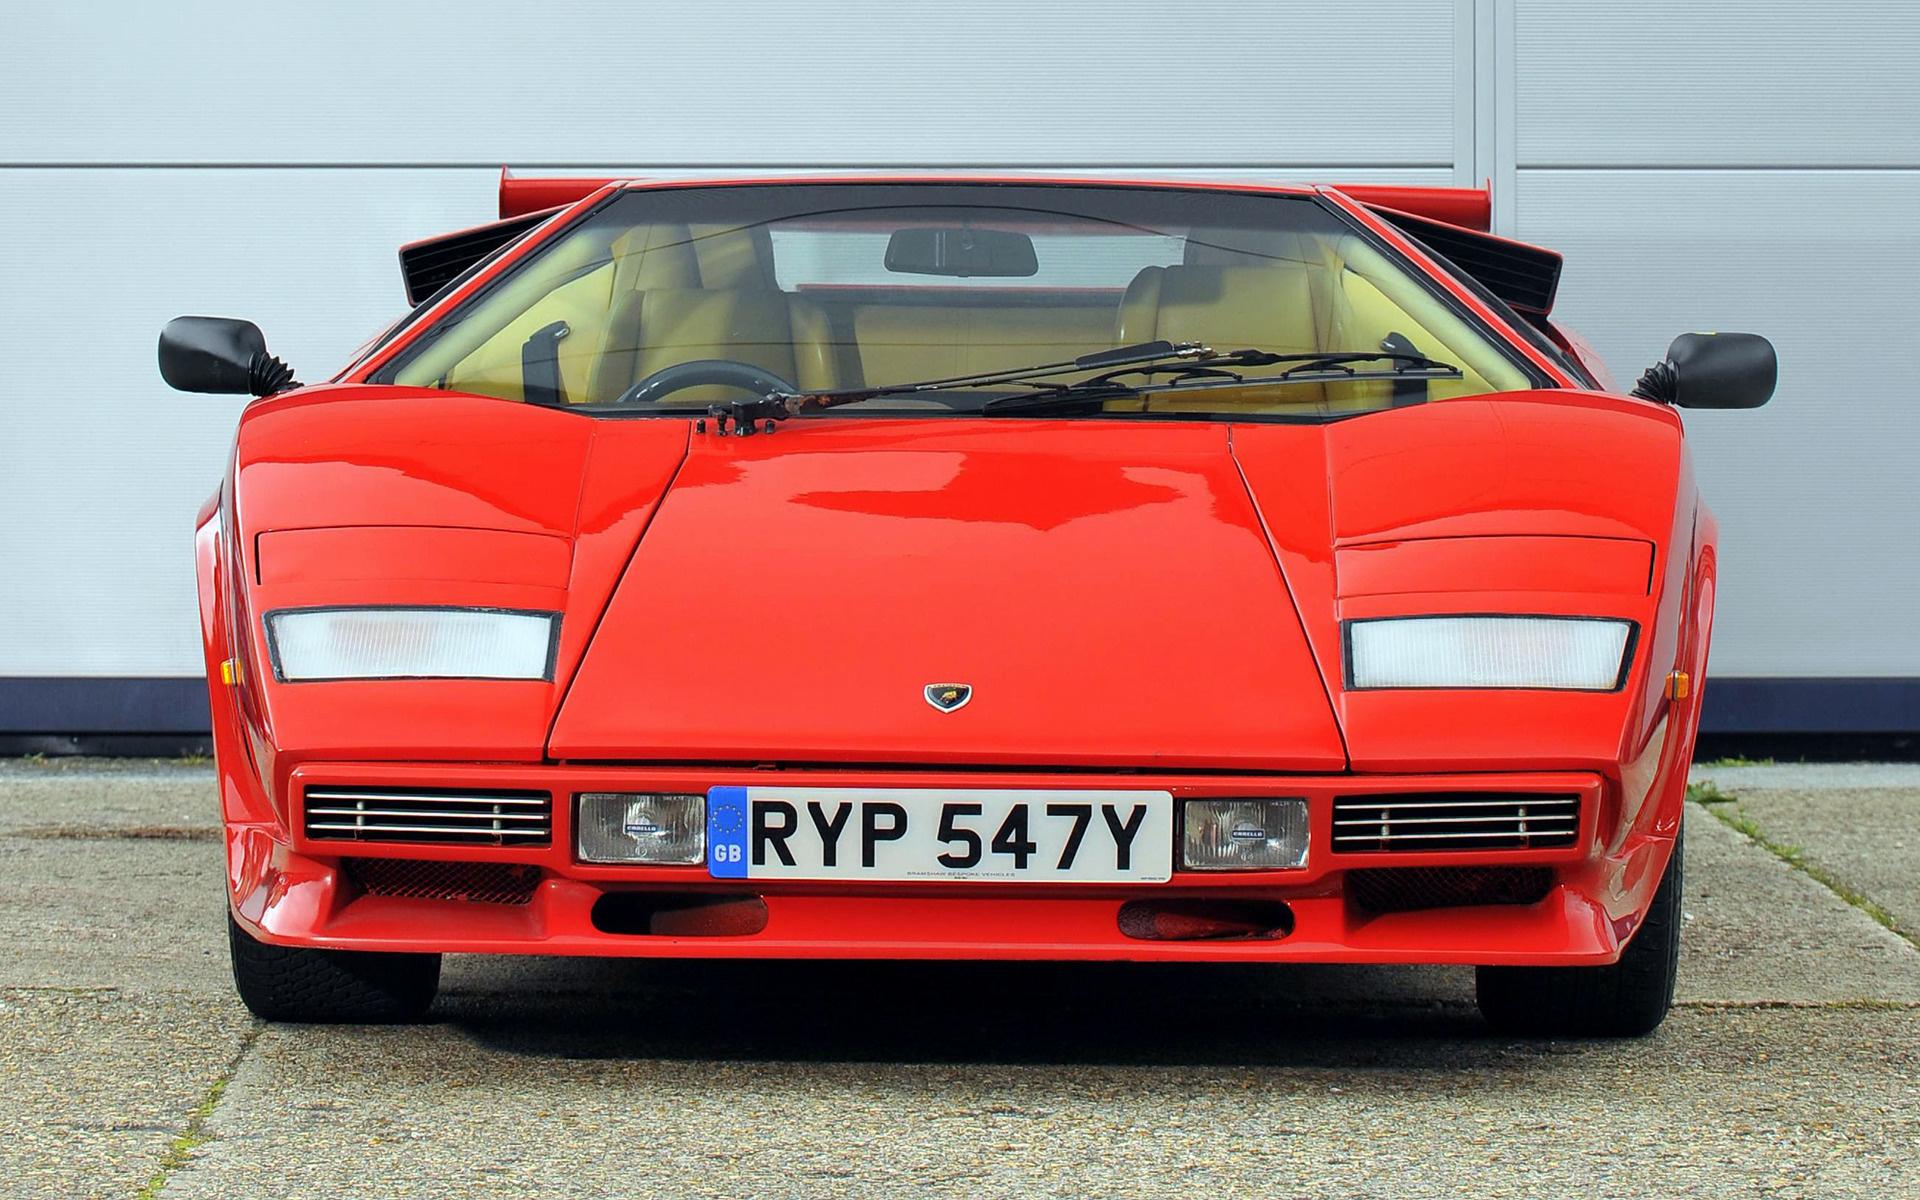 Lamborghini Countach Lp500 S 1982 Uk Wallpapers And Hd